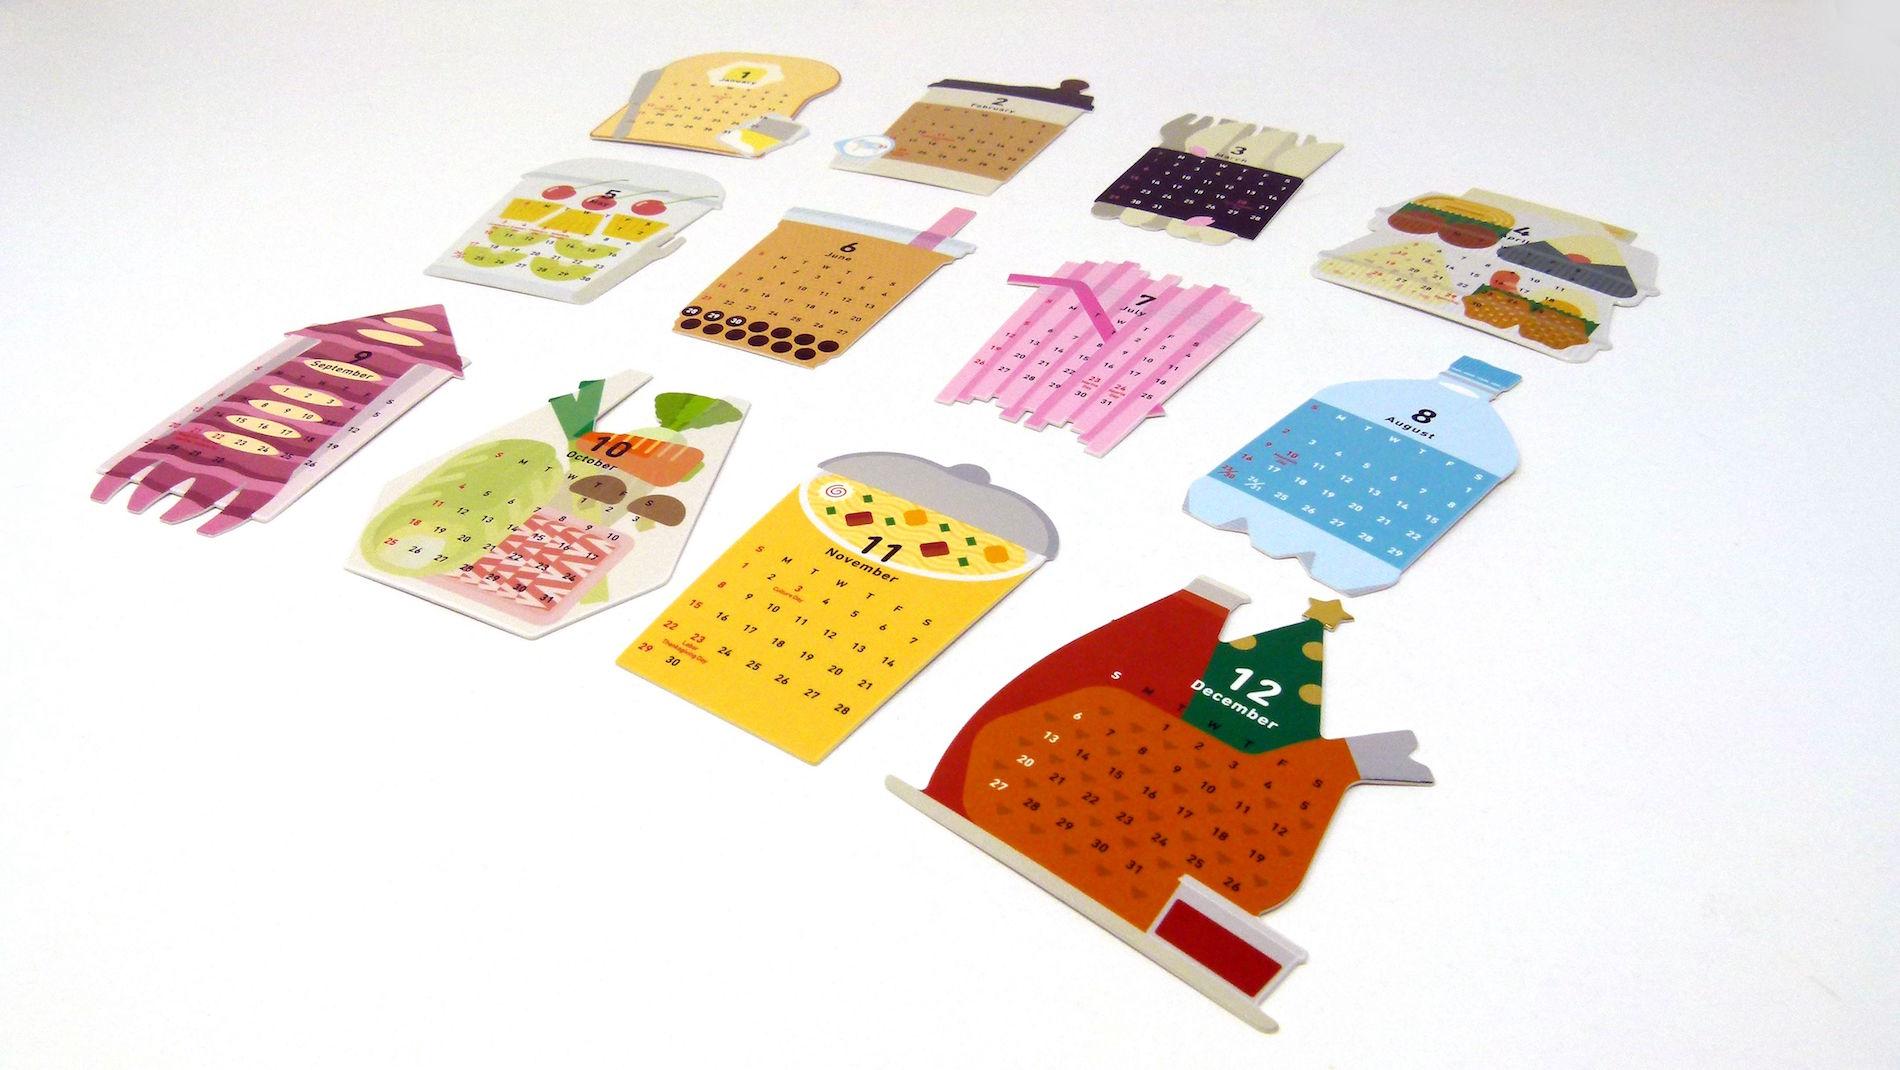 Ichikudo Zero Waste Calendar 2020 - PaperSpecs